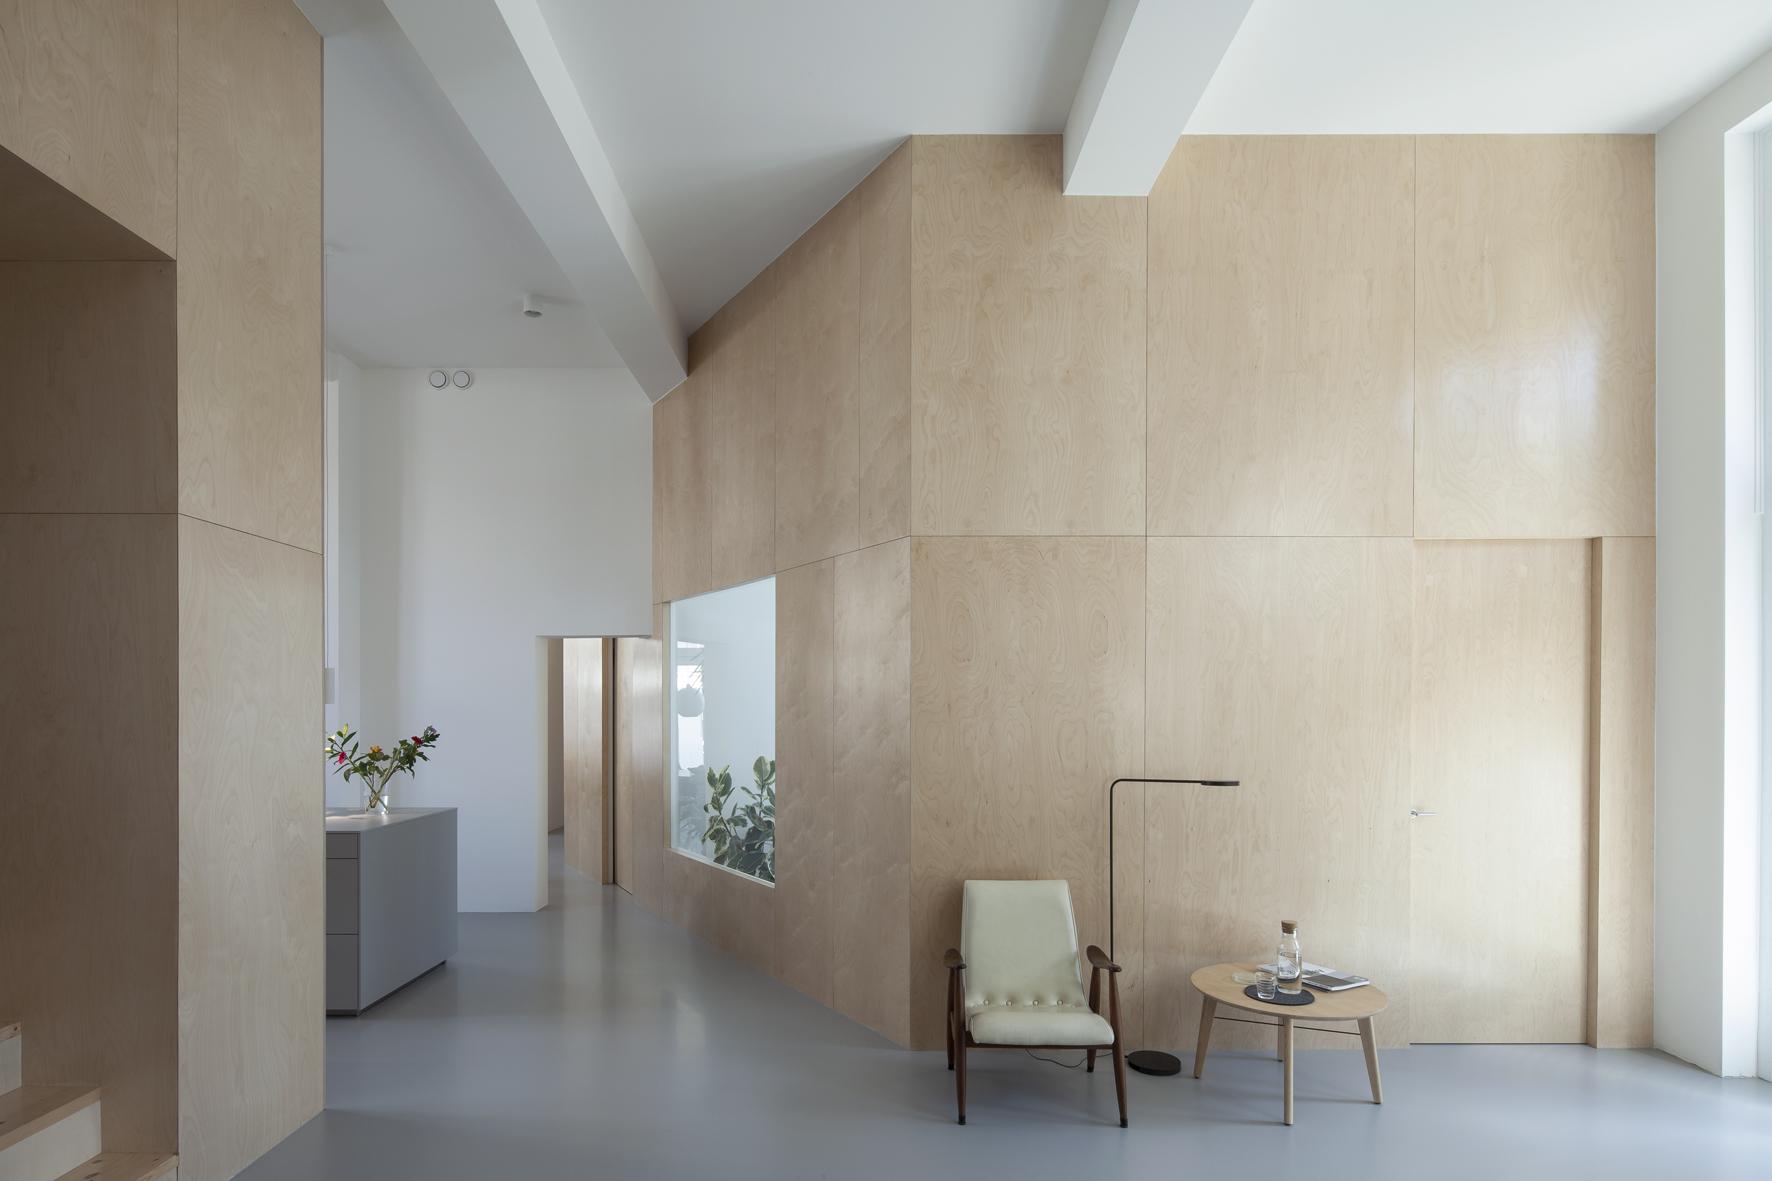 <p>Alba&#8217;s play, Den Haag &#8211; Ana Rocha architects. Beeld Christiane Wirth</p>